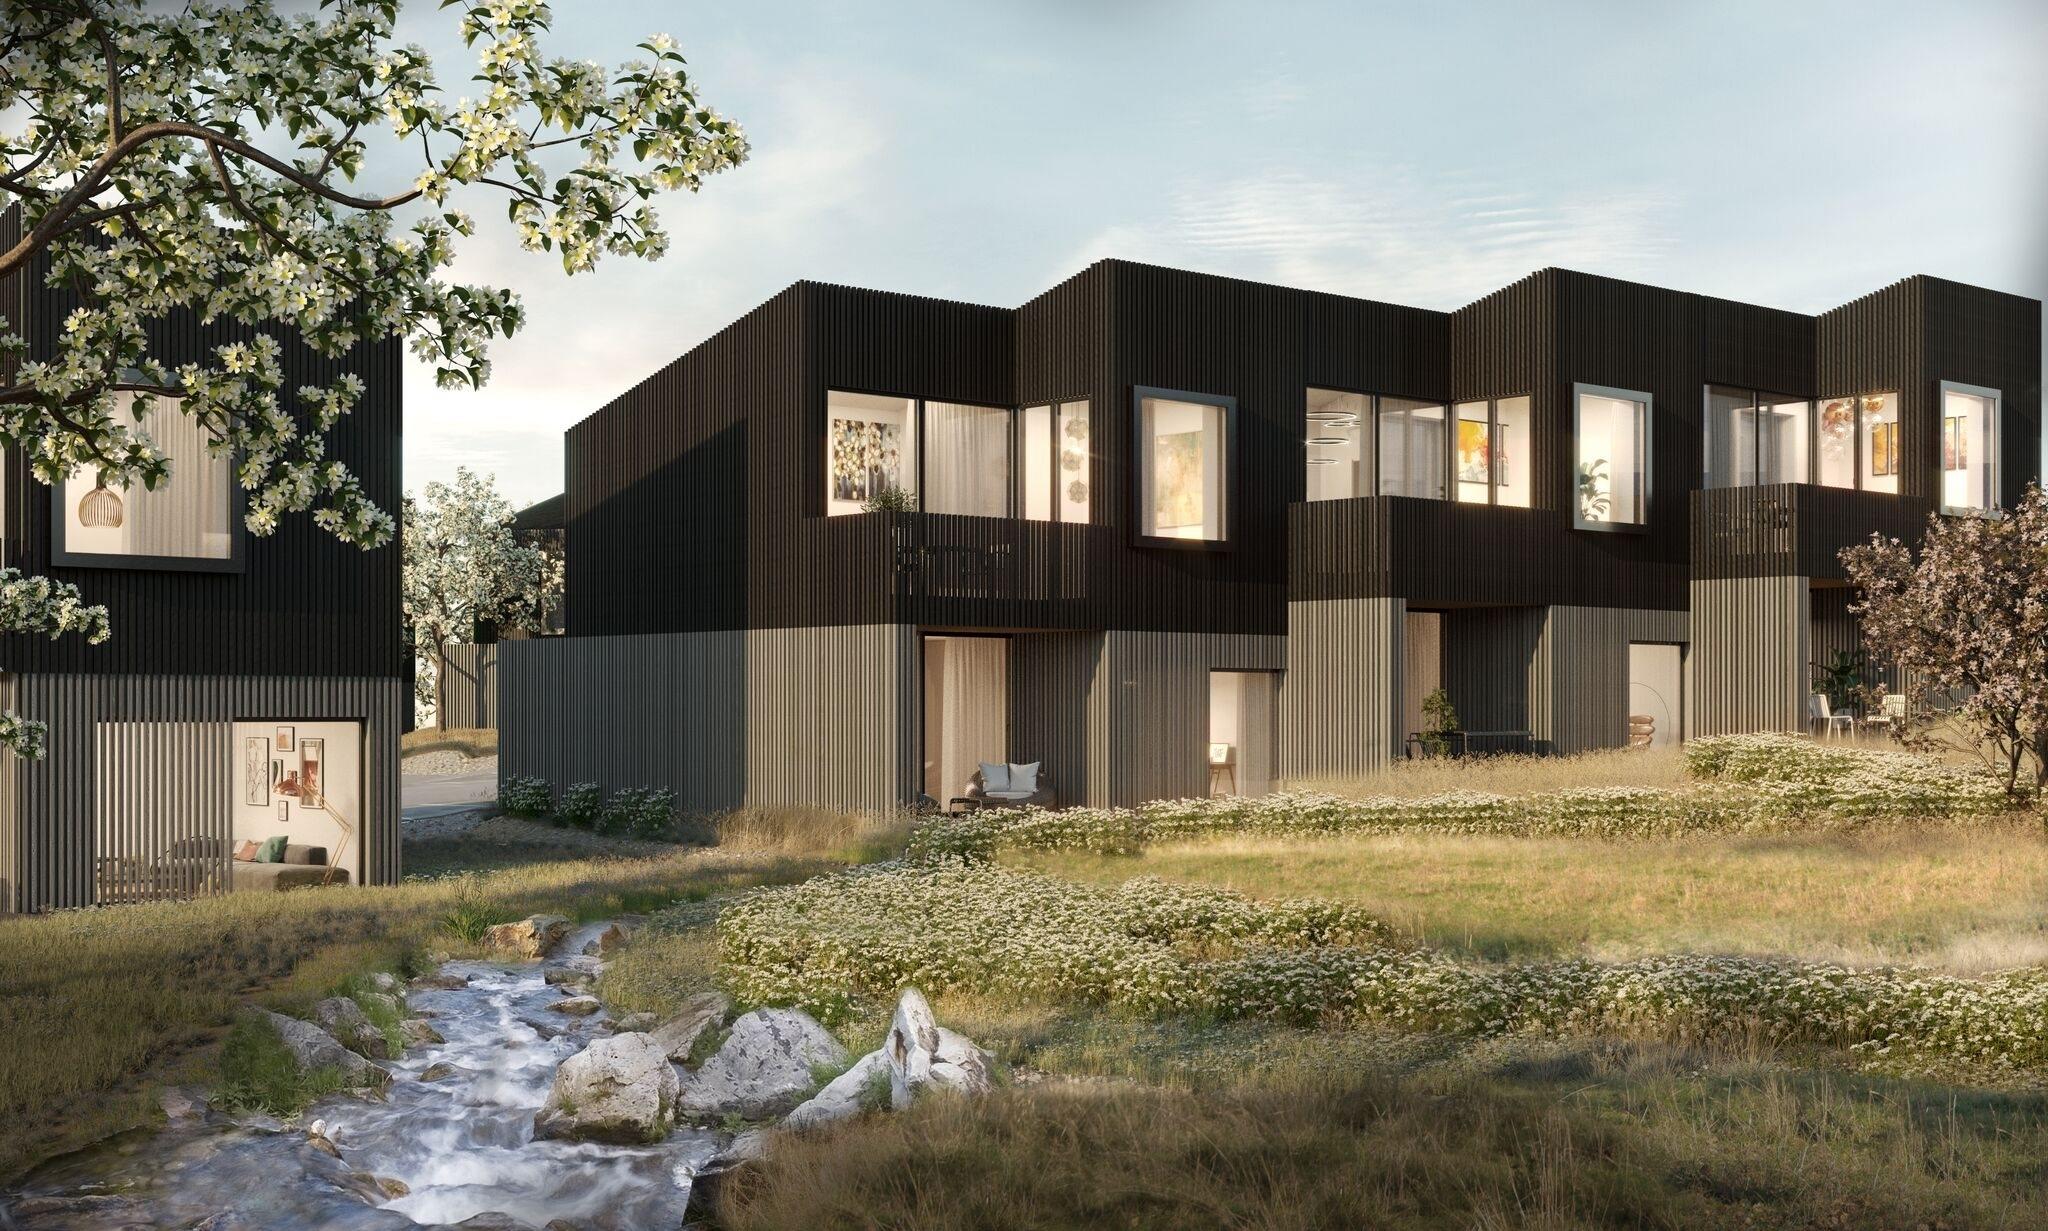 Rækkehus til Salg - Toppen 99, trekroner, 4000 Roskilde